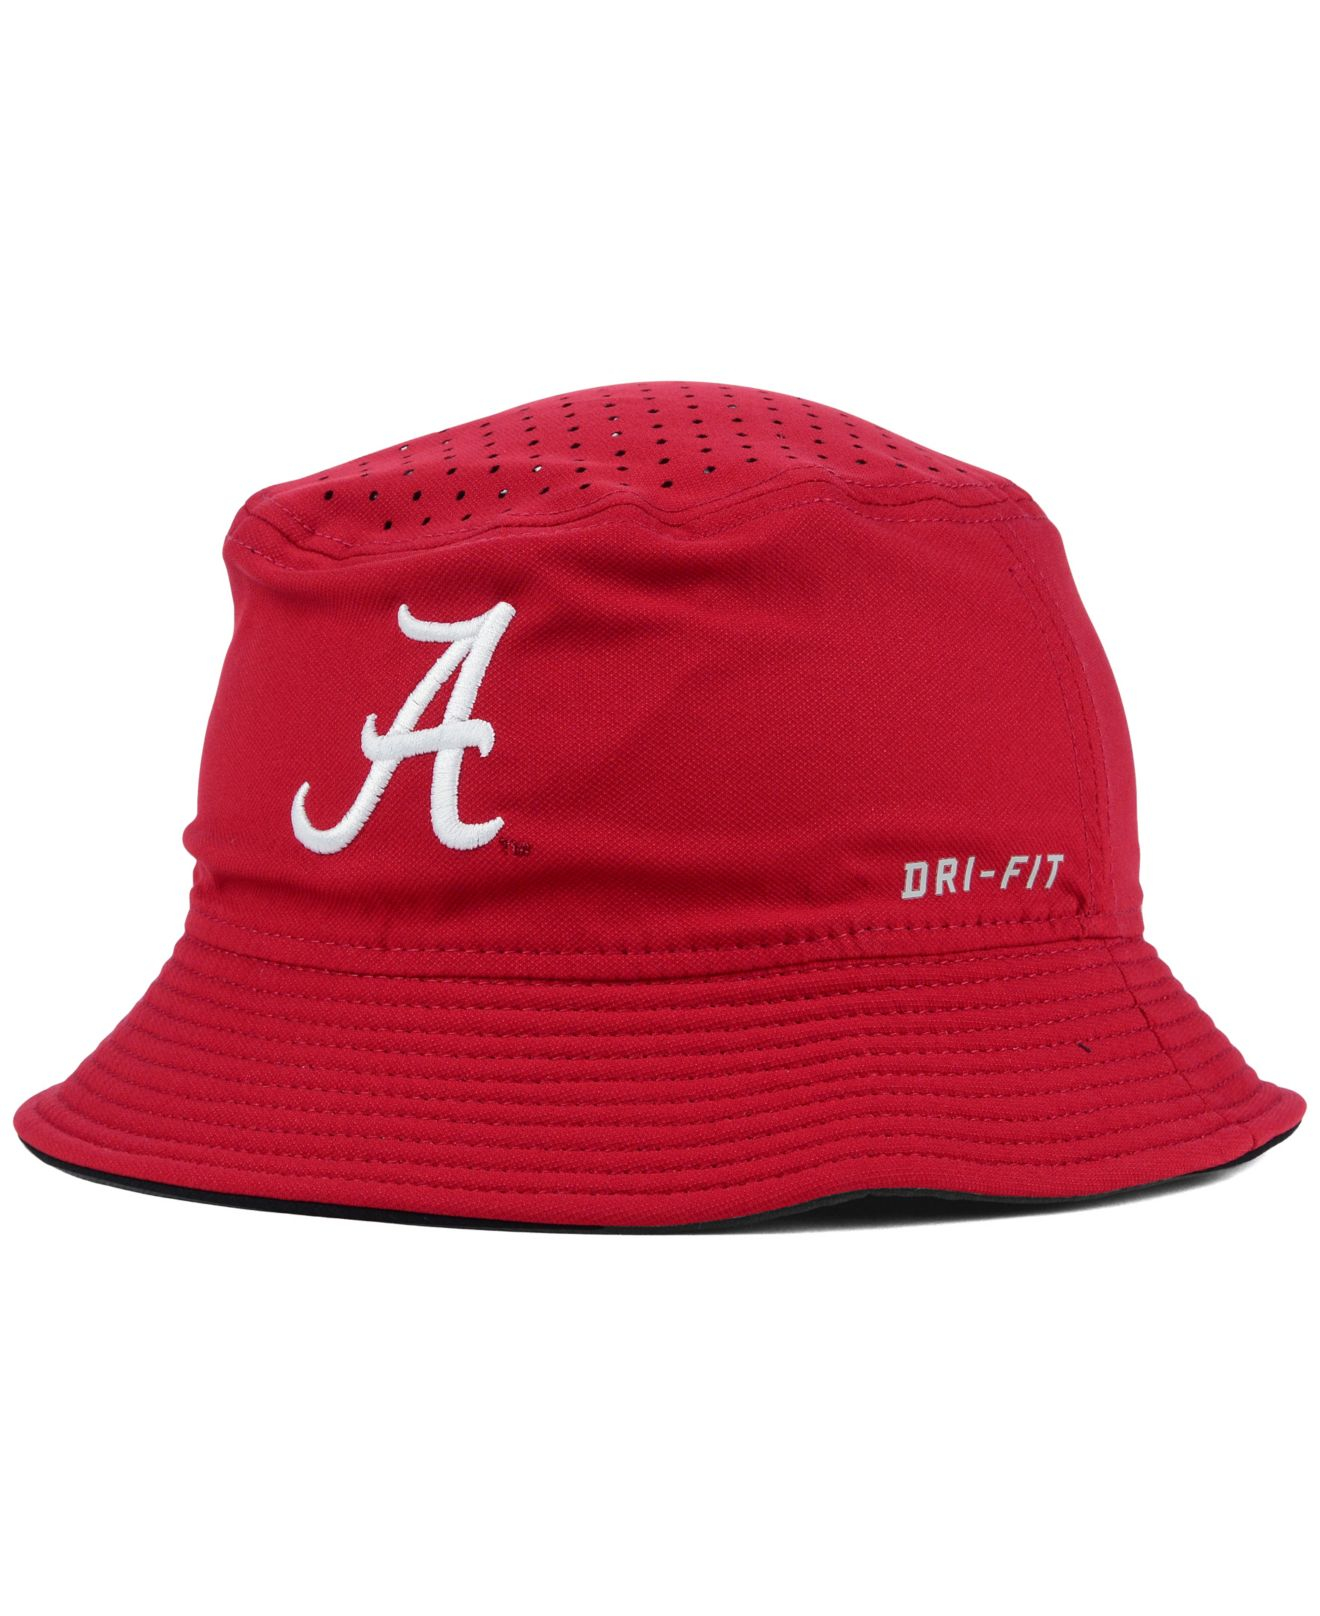 44fe09f753c ... closeout lyst nike alabama crimson tide vapor bucket hat in purple for  men 06fb4 5a296